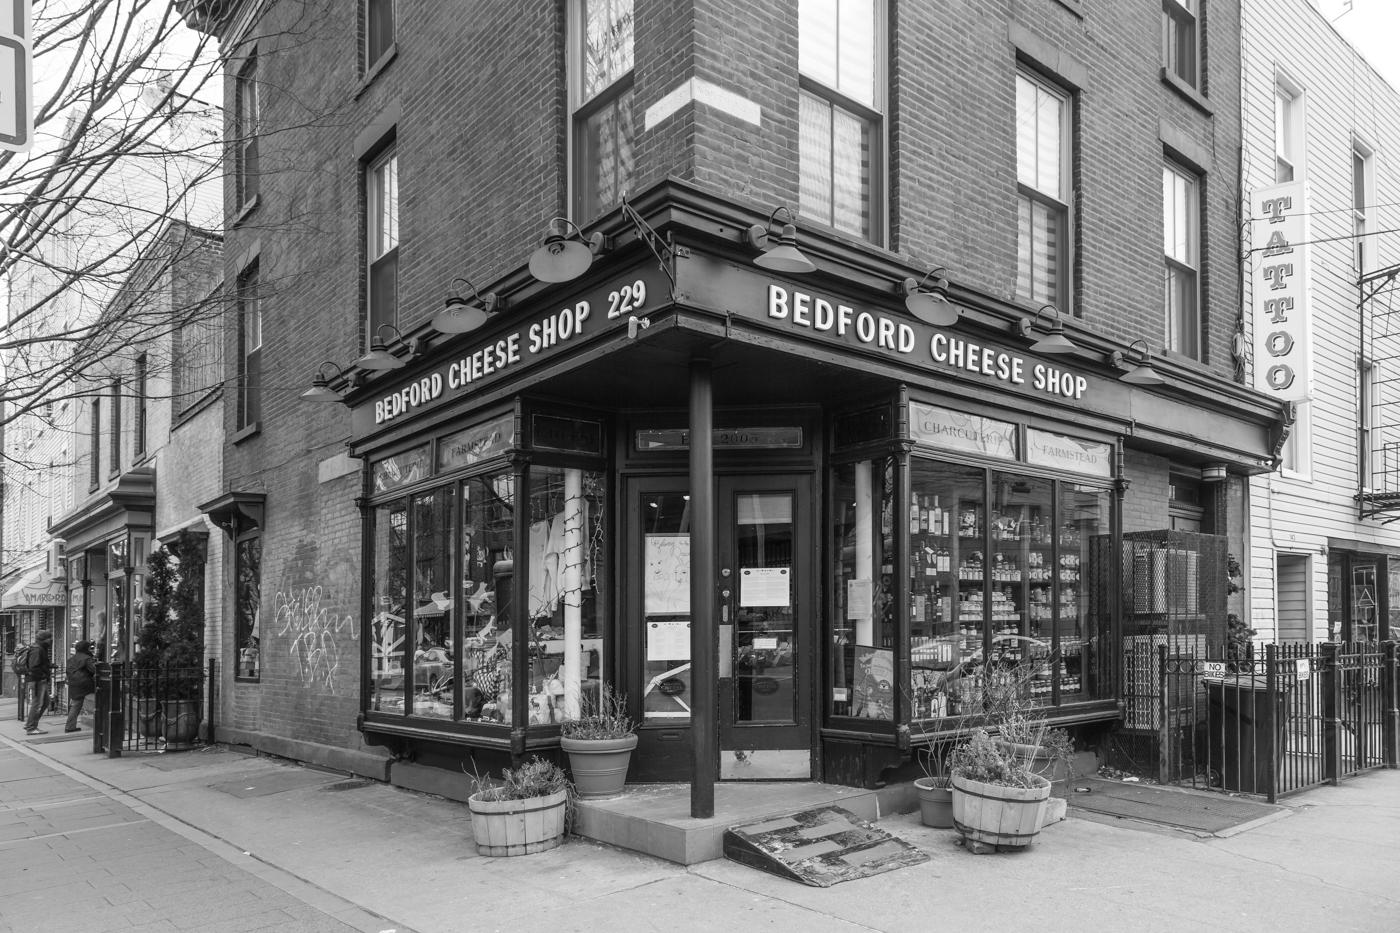 Brooklyn Cheese Shop (c) Bob Bass